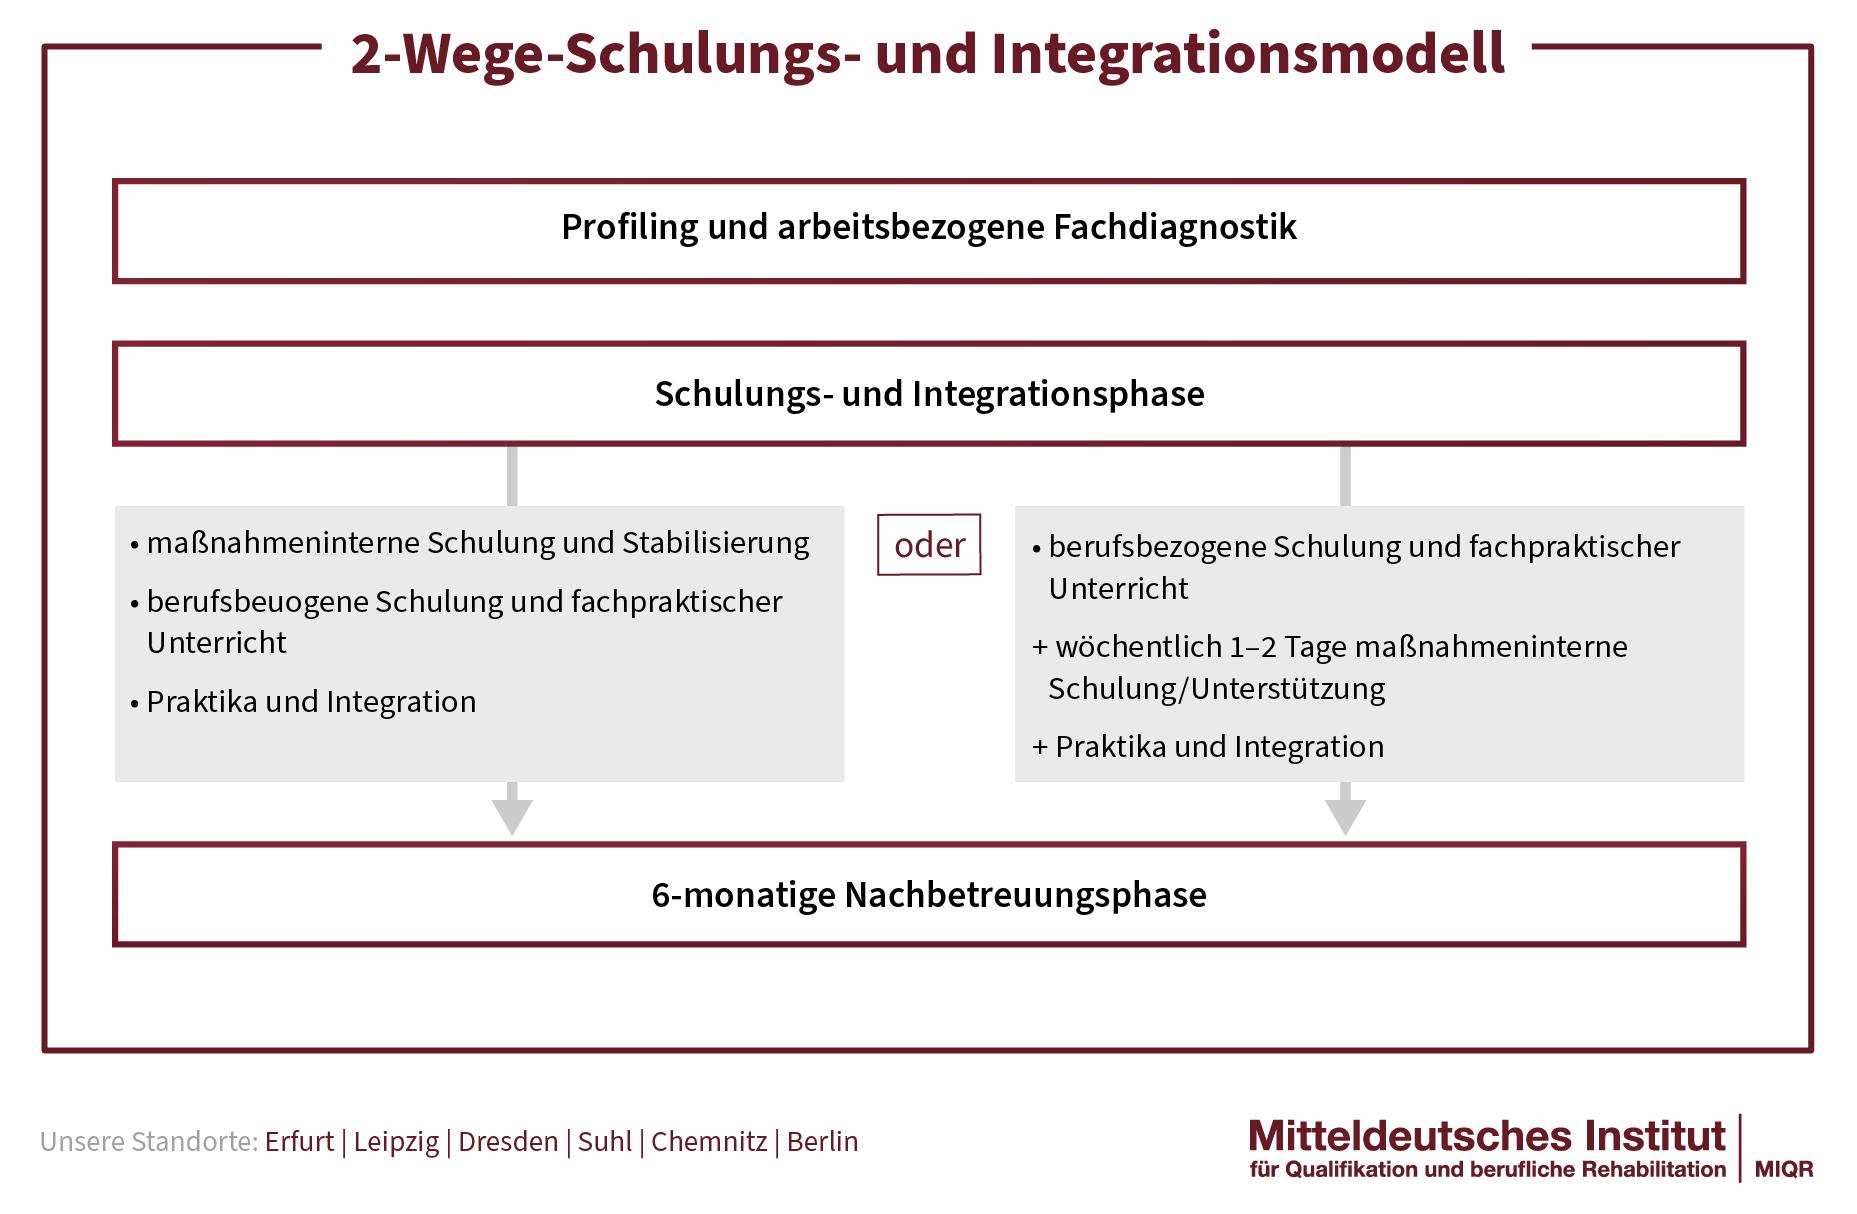 OSI_2_Wege_Schulungs-_und_Integrationsmodell